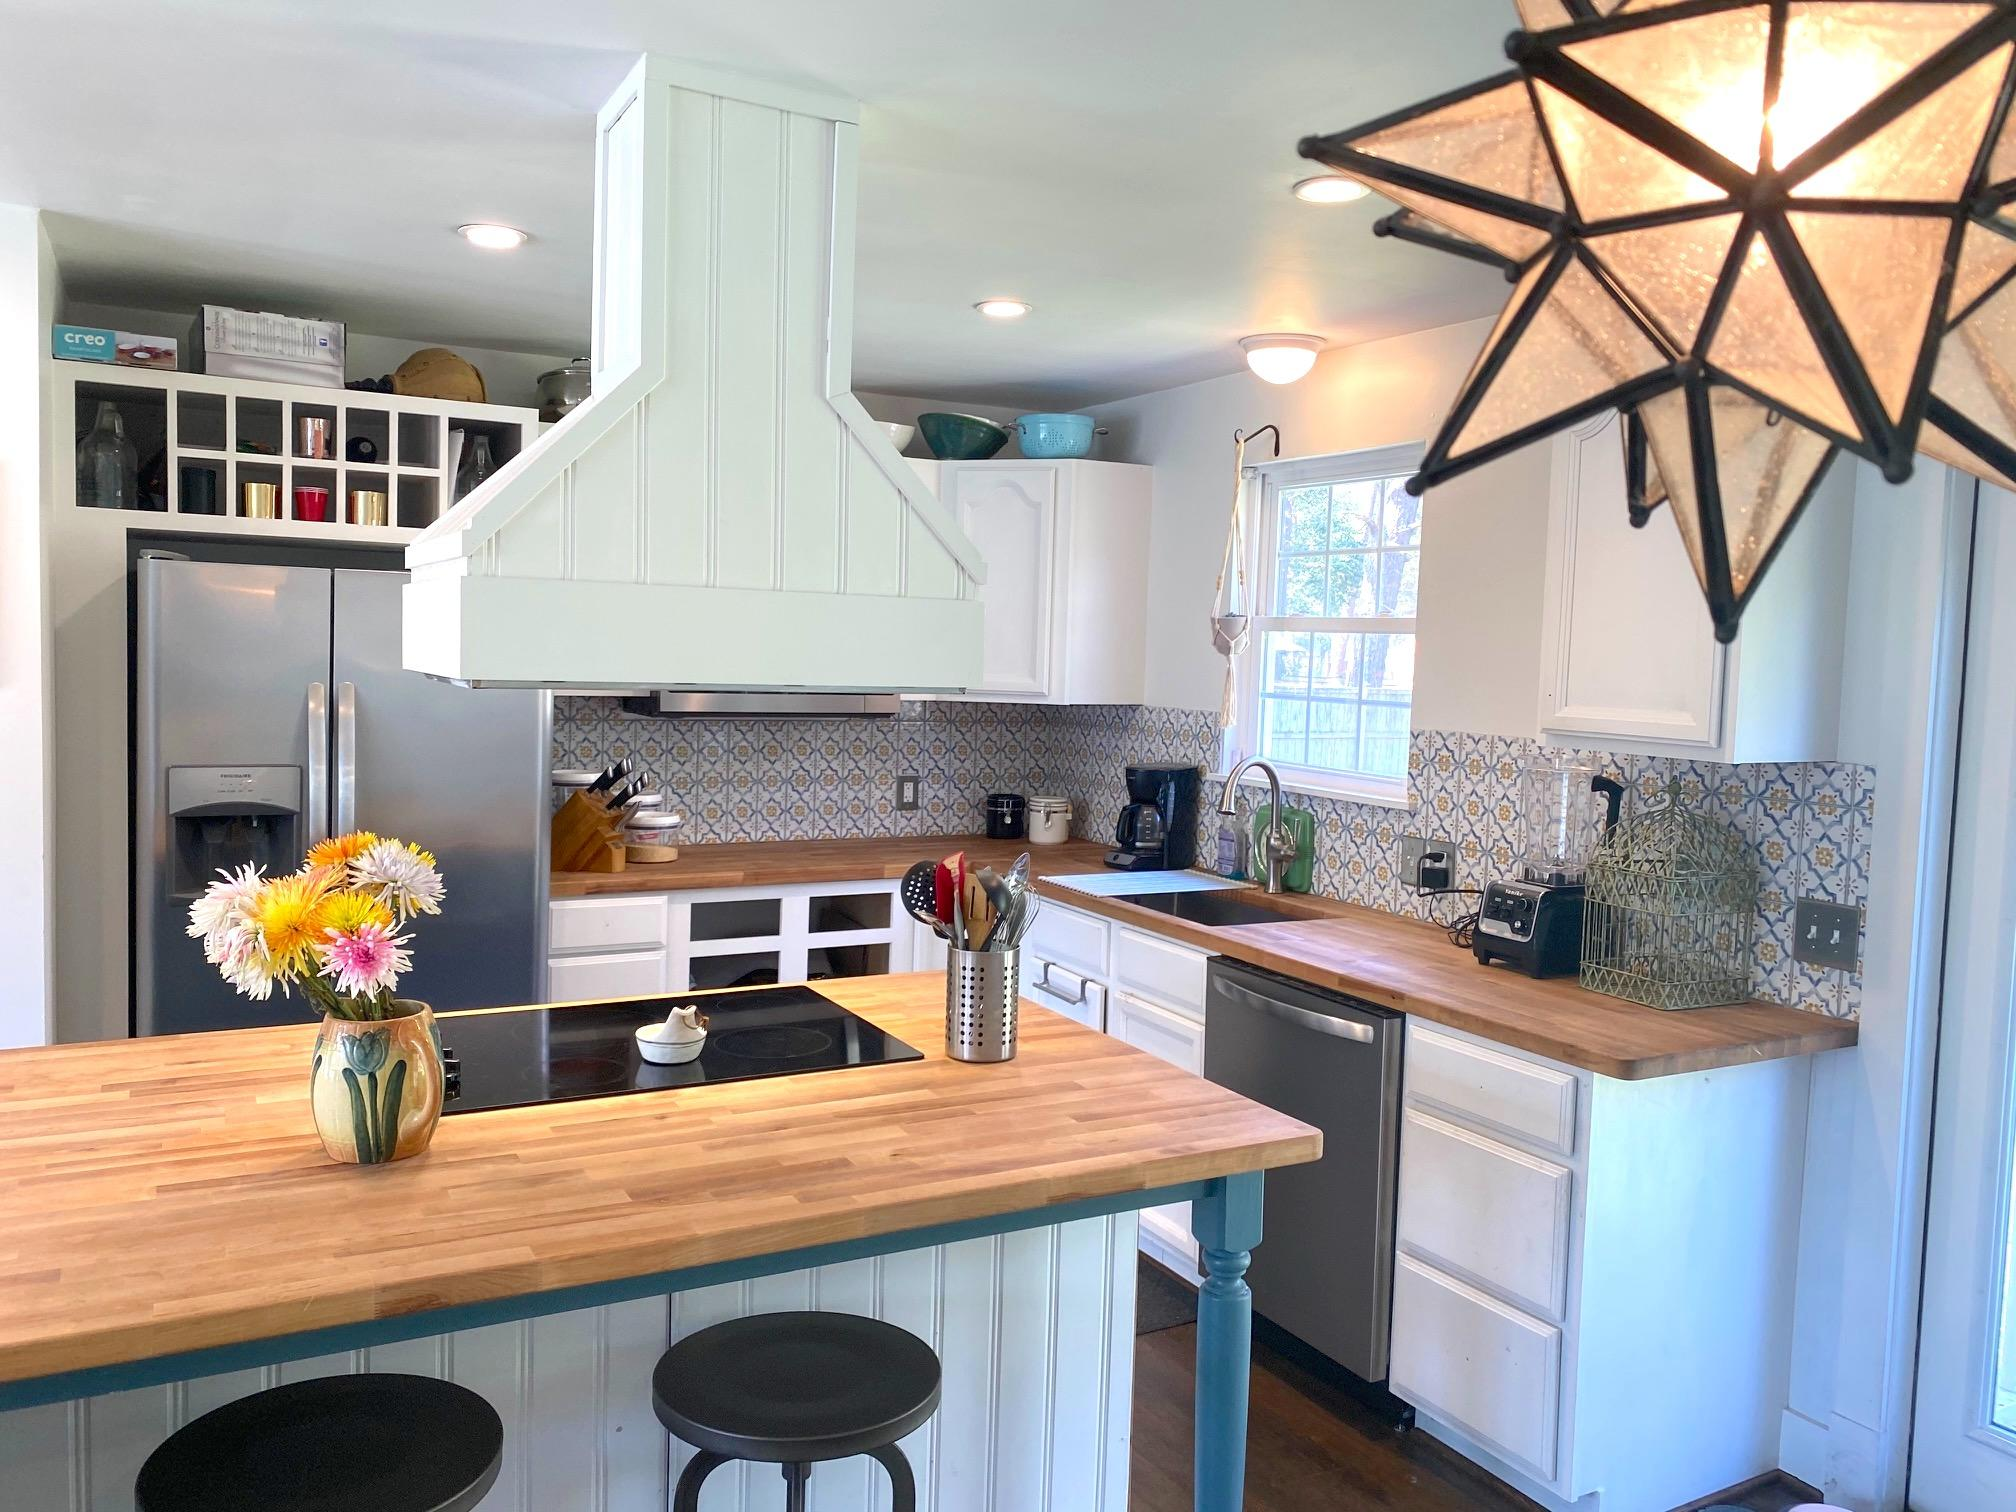 Stafford Heights Homes For Sale - 3472 Cynthia, Johns Island, SC - 2